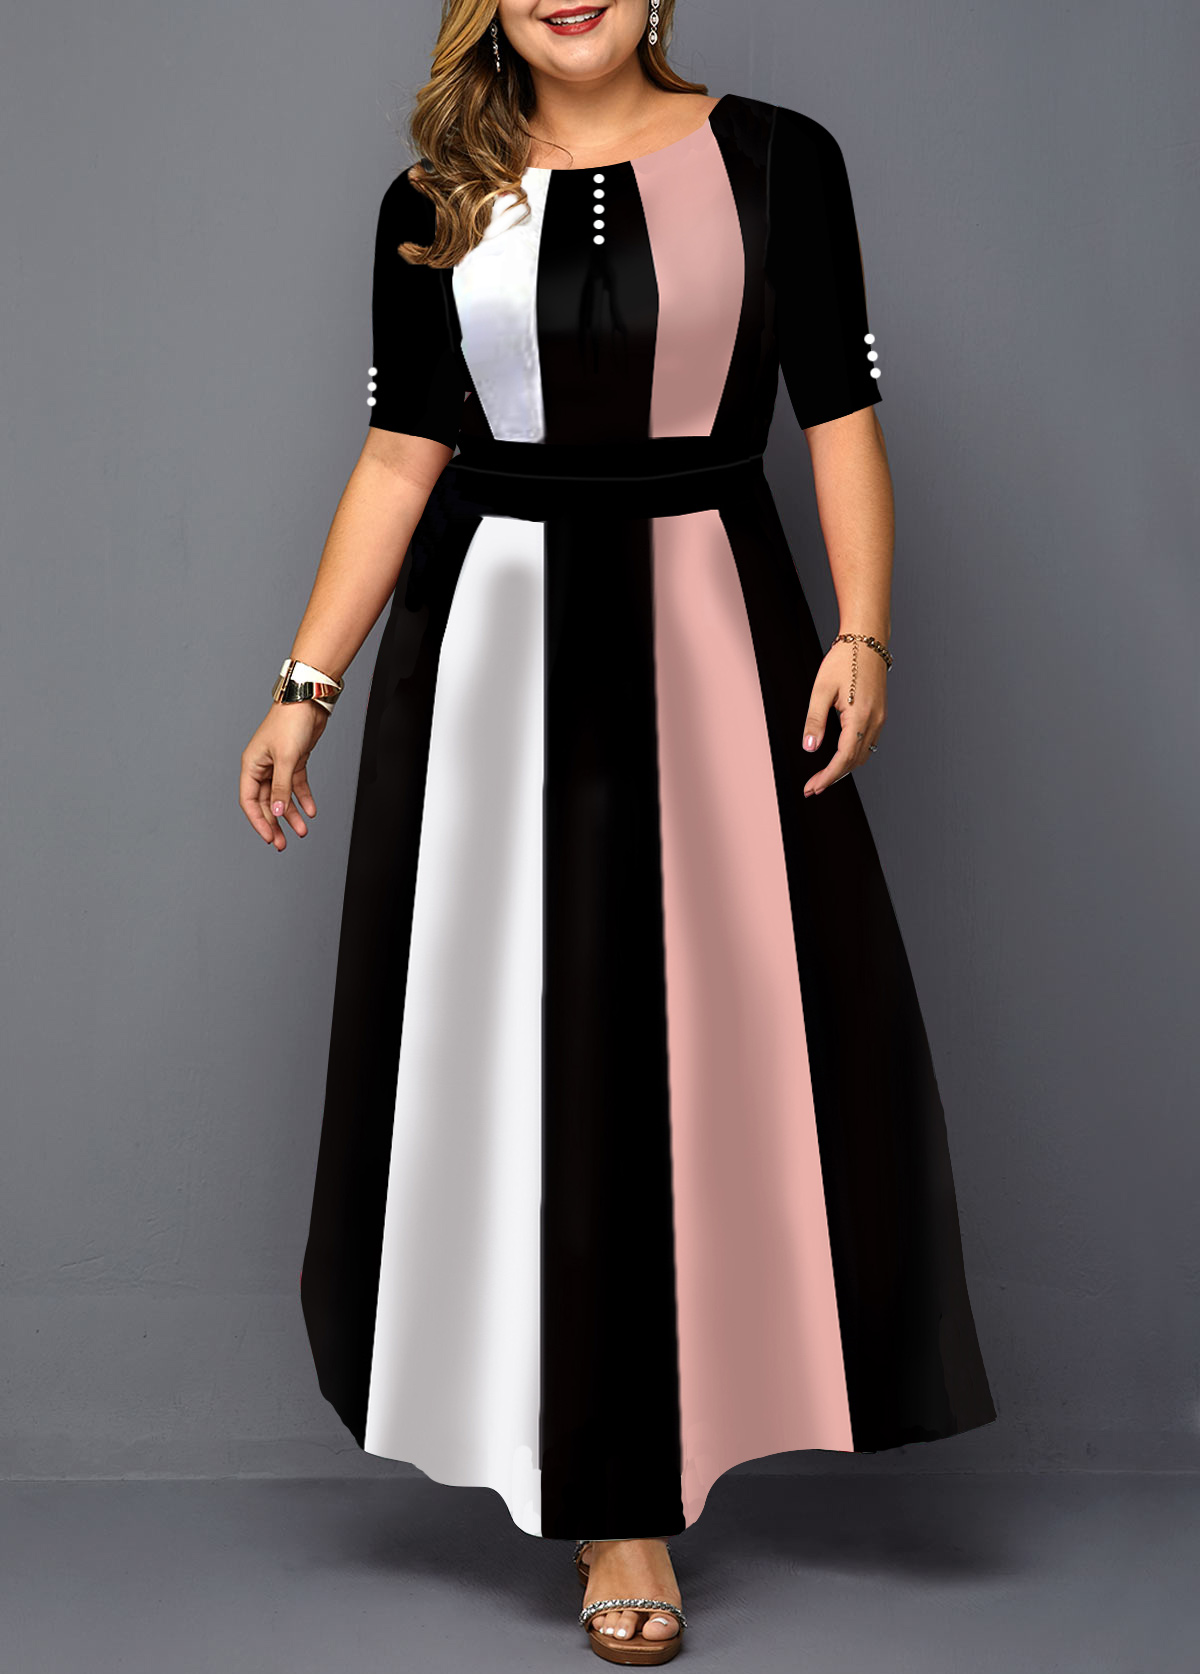 Plus Size Color Block Half Sleeve Maxi Dress | modlily.com - USD $33.33